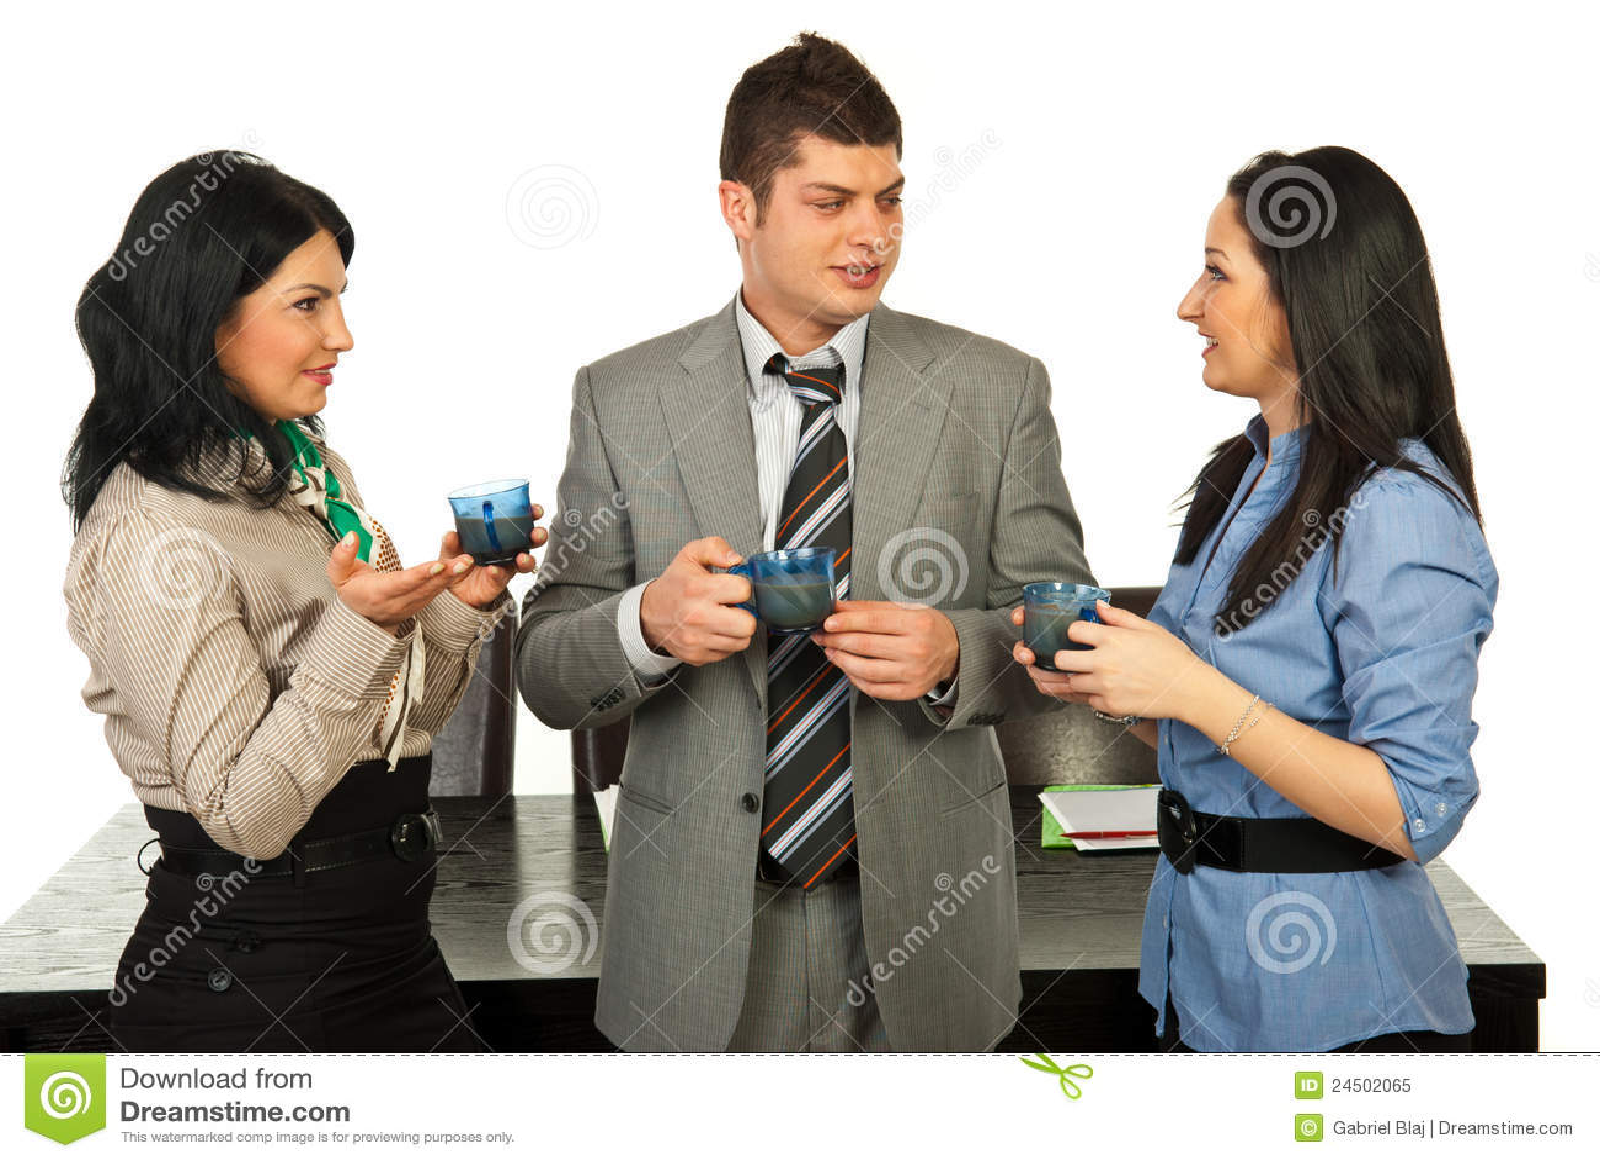 People Conversation In Coffee Break Royalty Free Stock ...